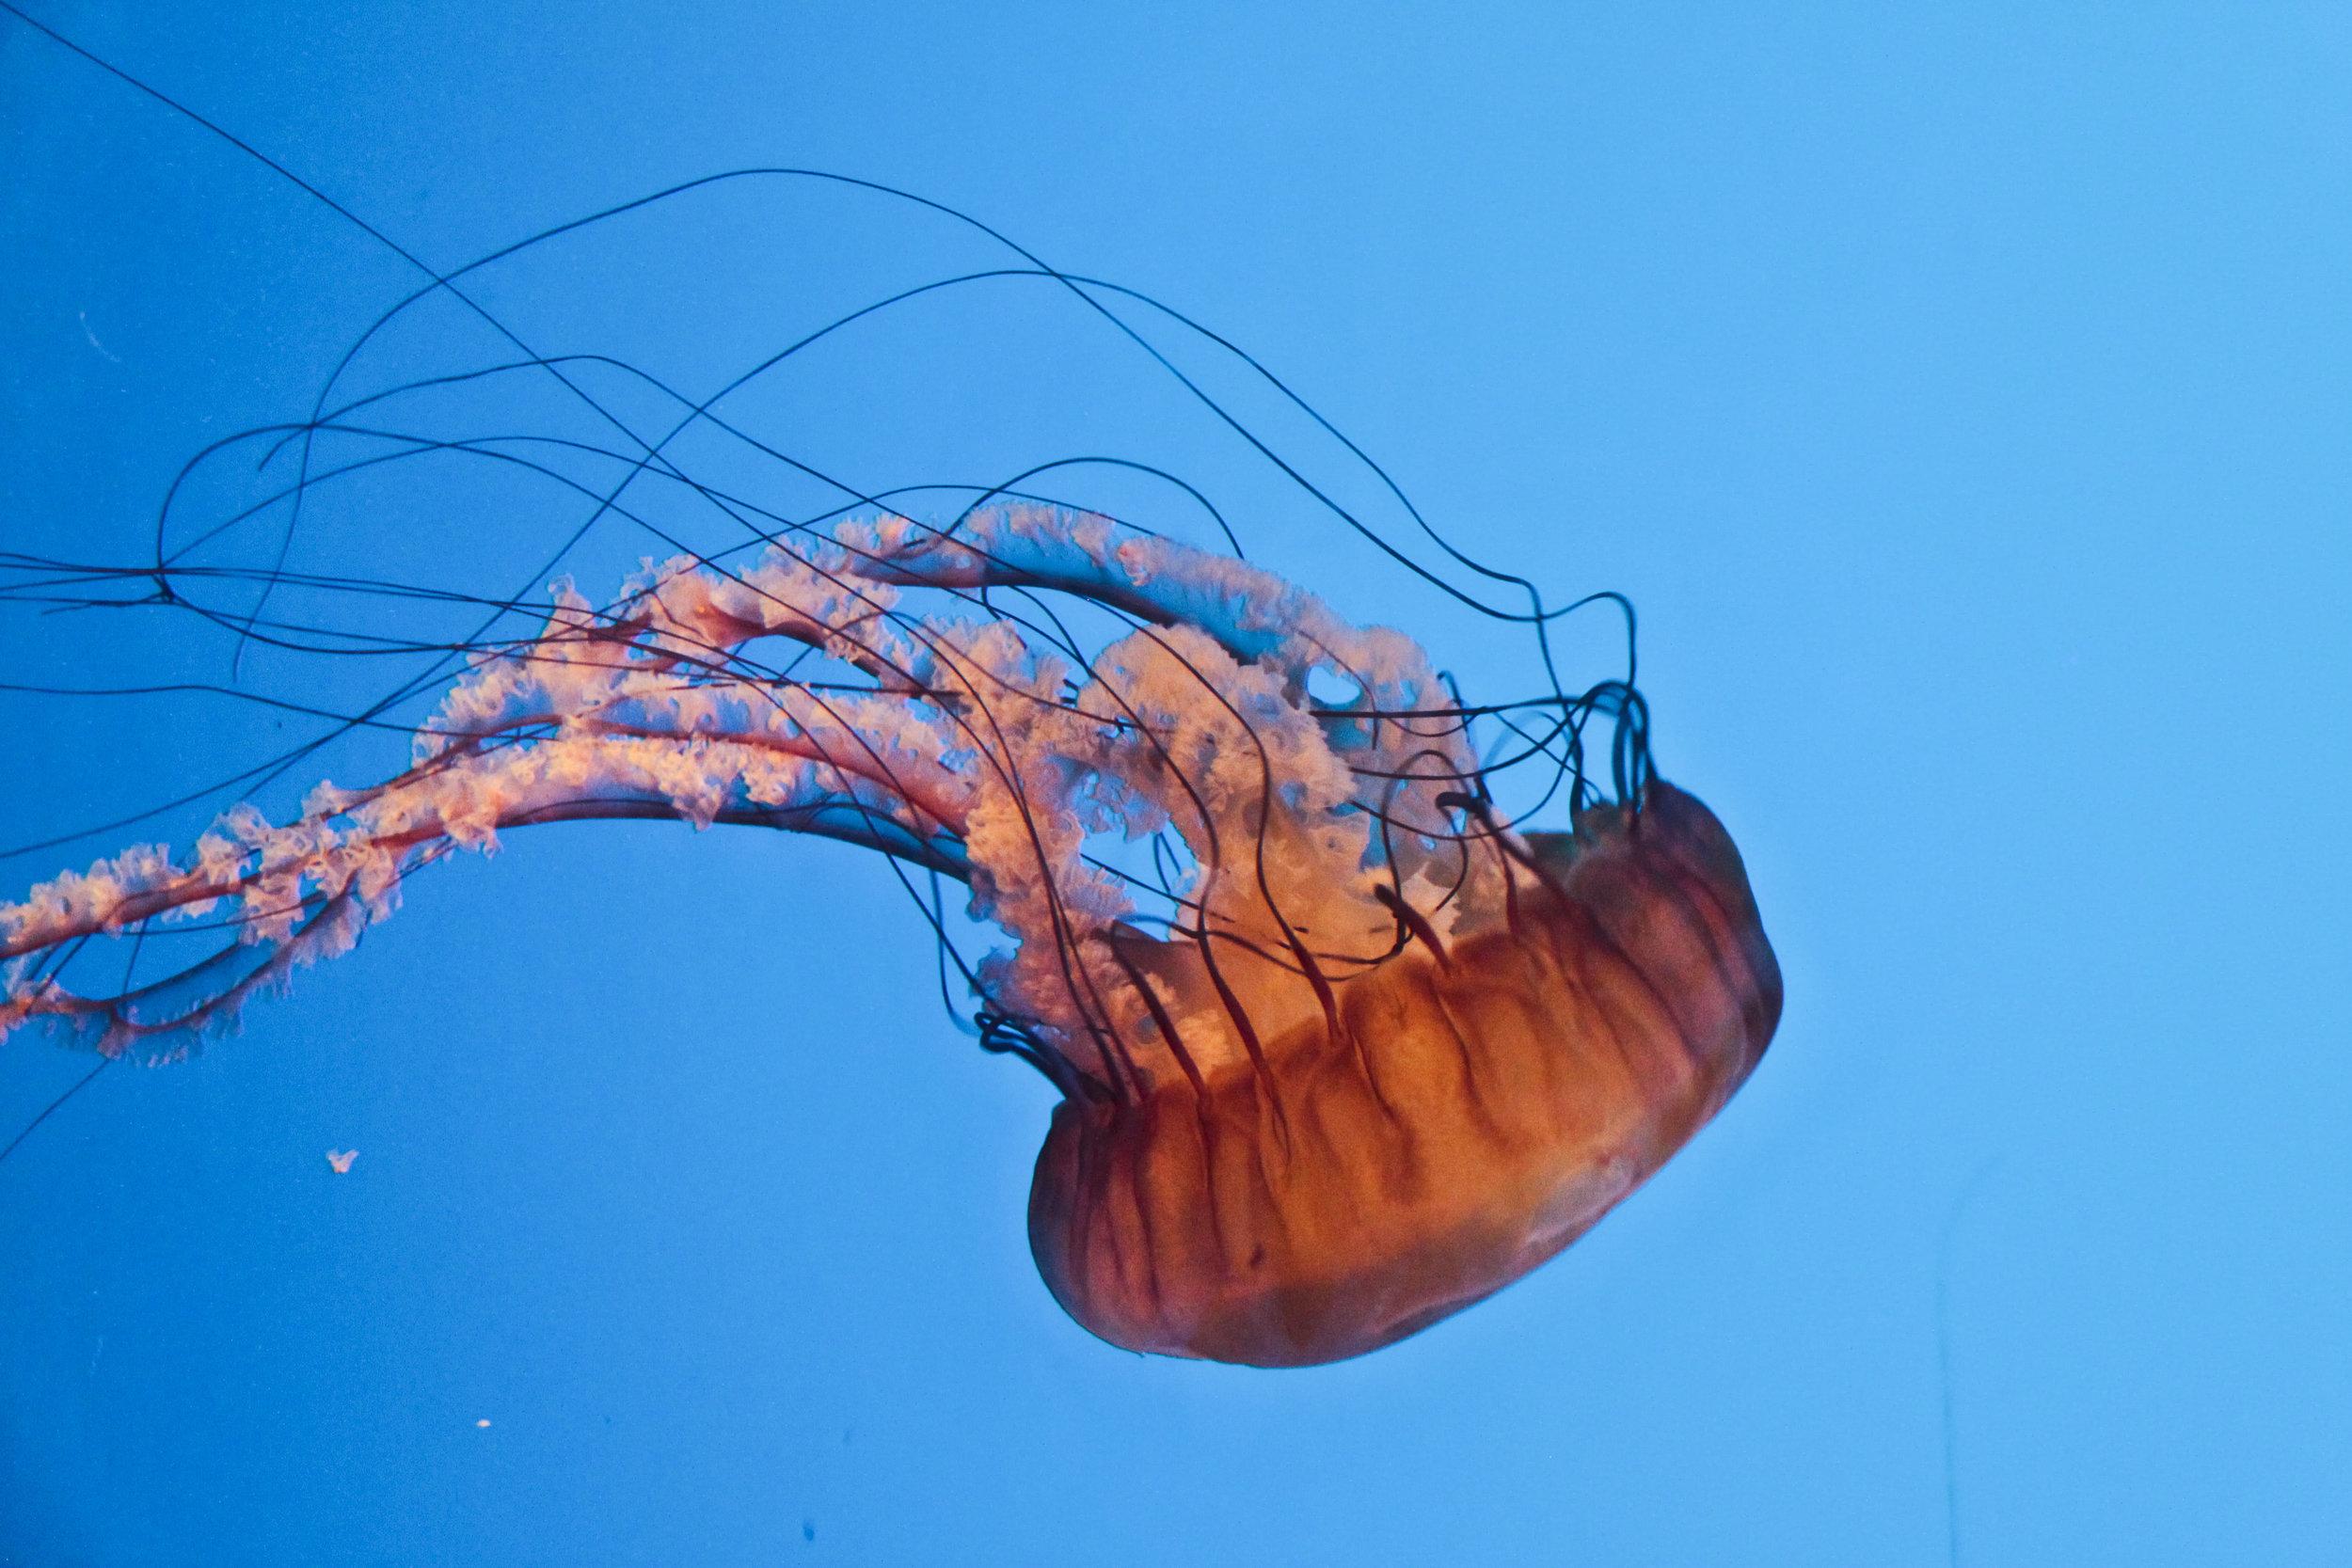 20170924_Snap-snap_Jellyfish_Edited_2.jpg